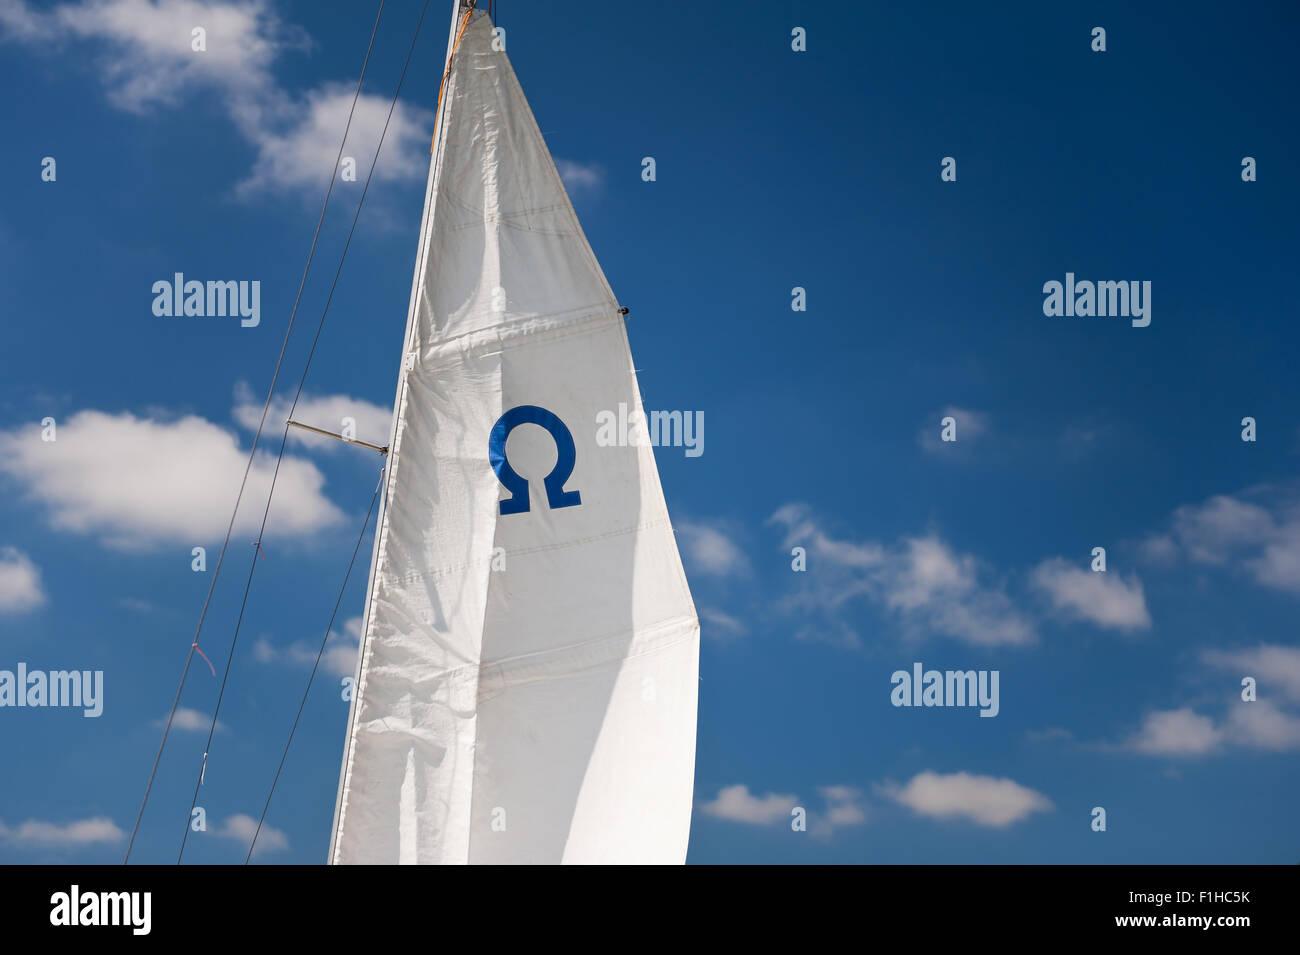 Blue Omega sign mast detail - Stock Image